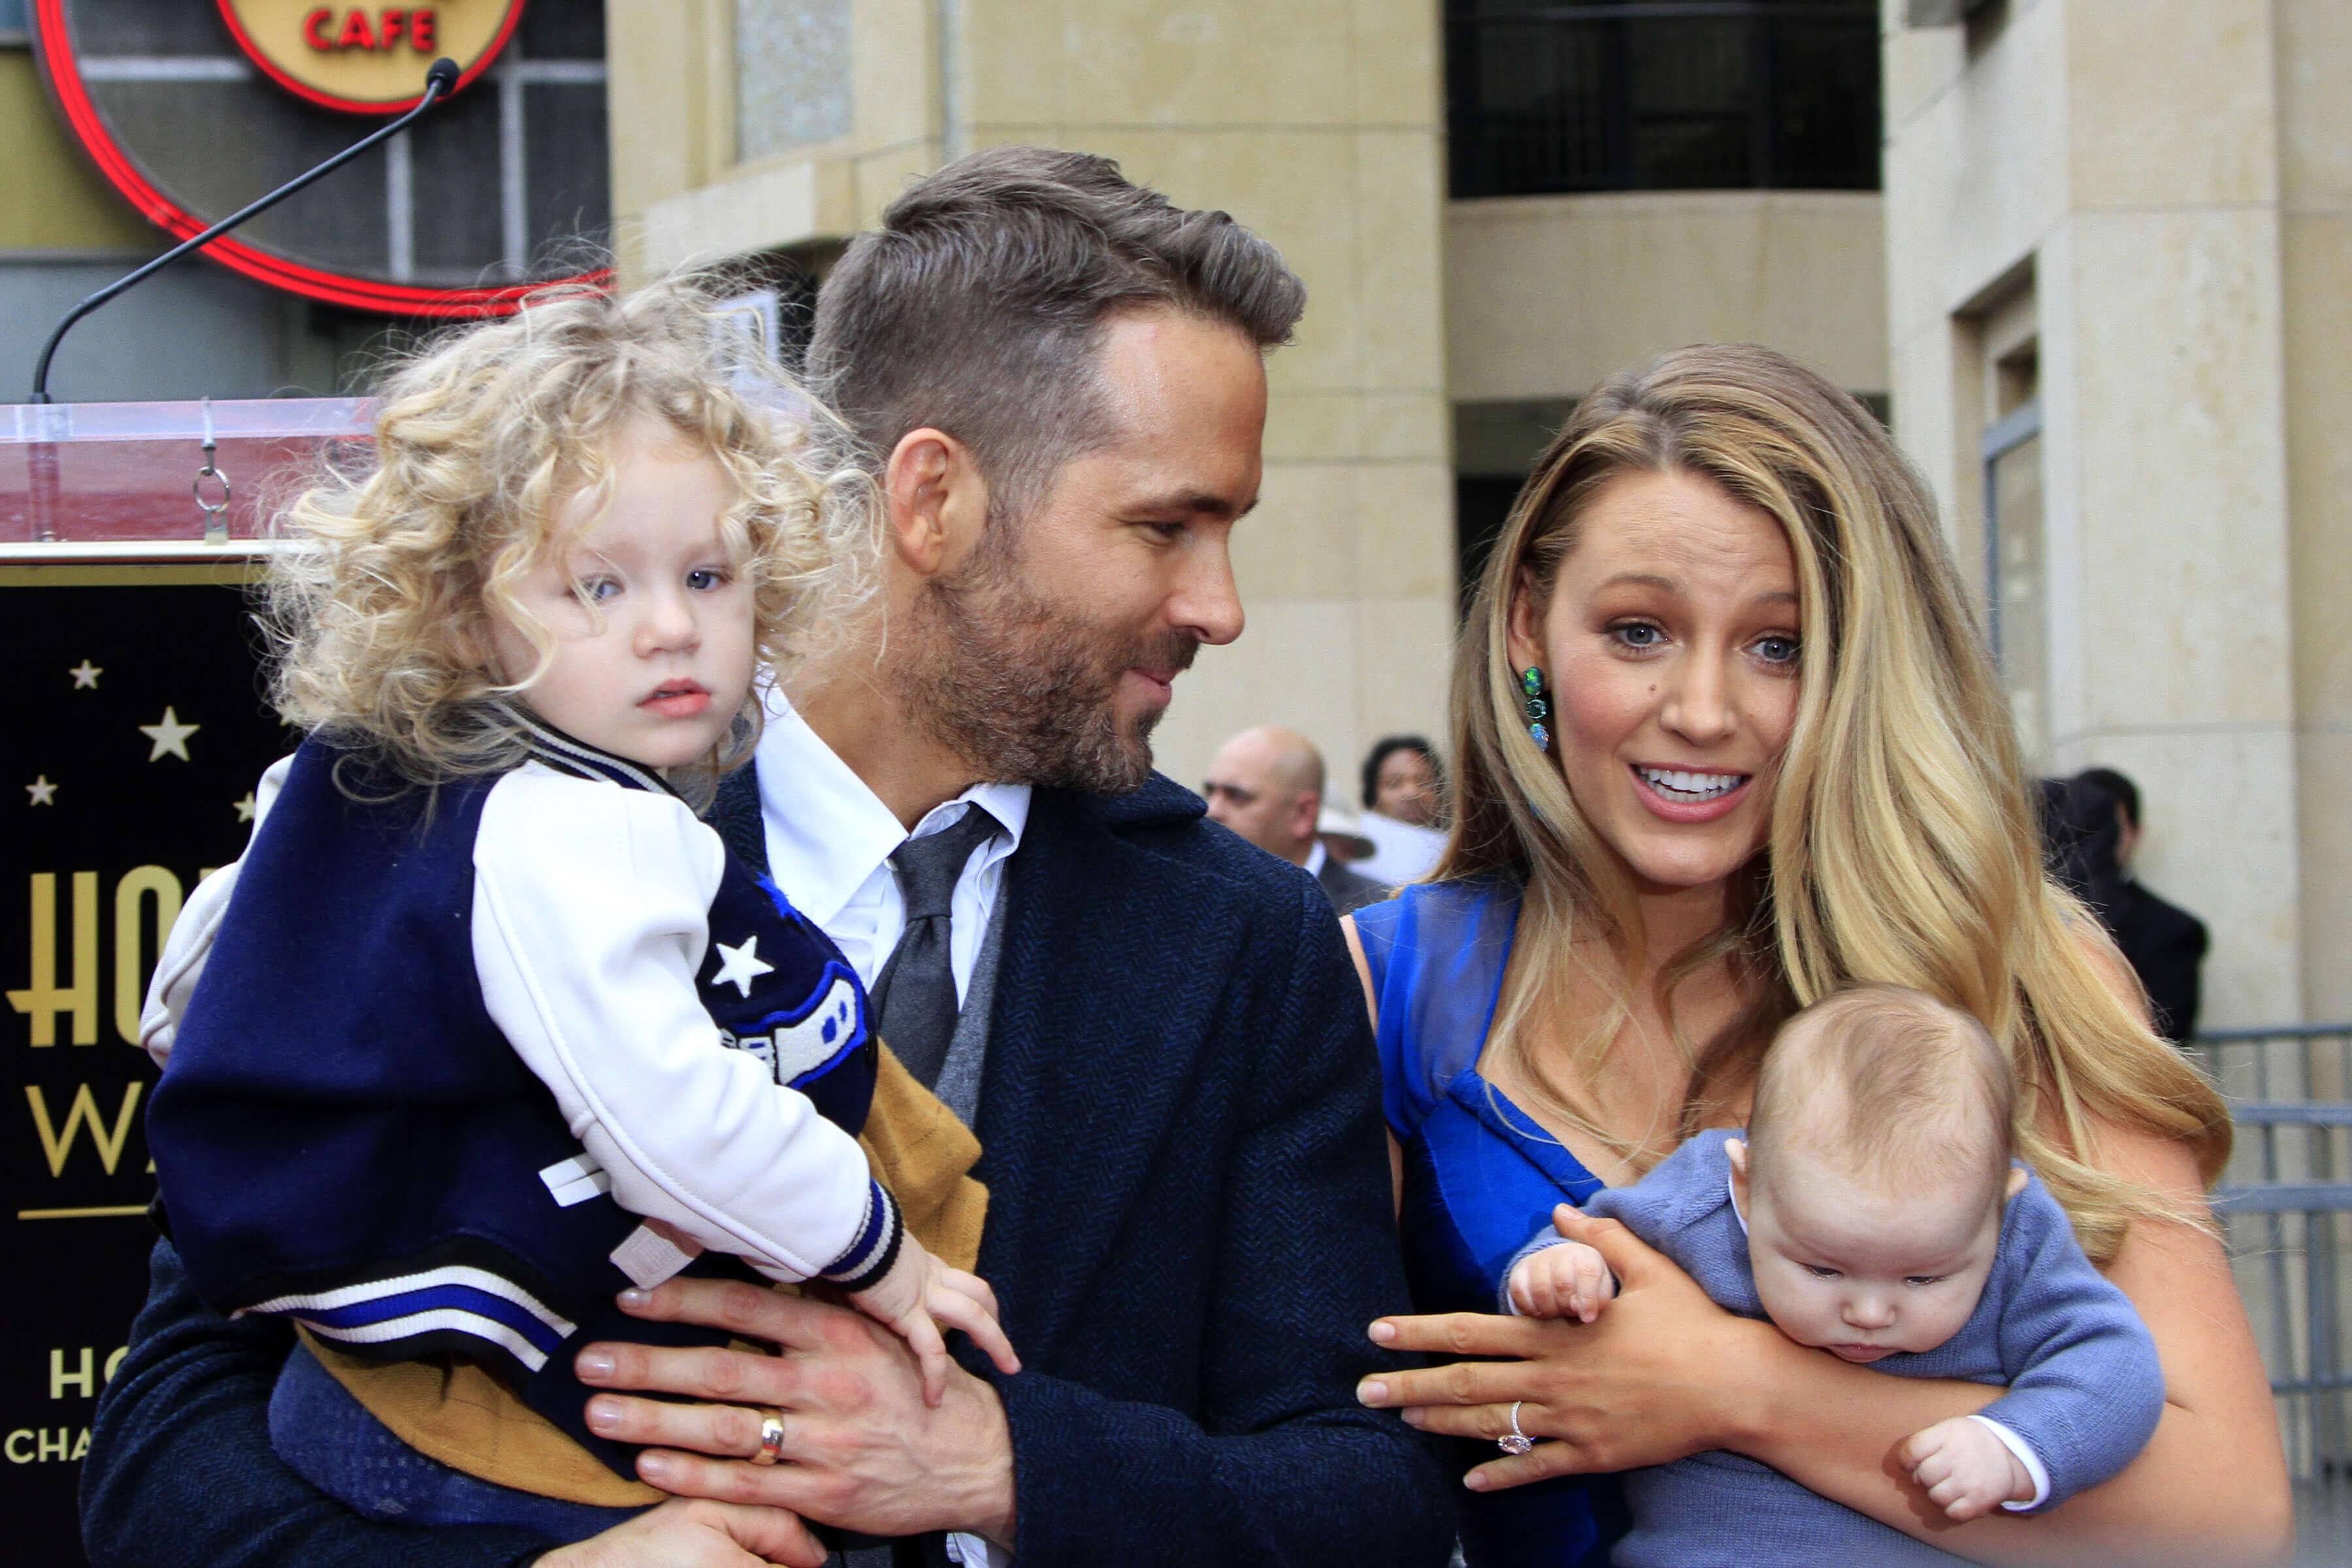 Ryan Reynolds and Blake Lively ©Kathy Hutchins / Shutterstock.com